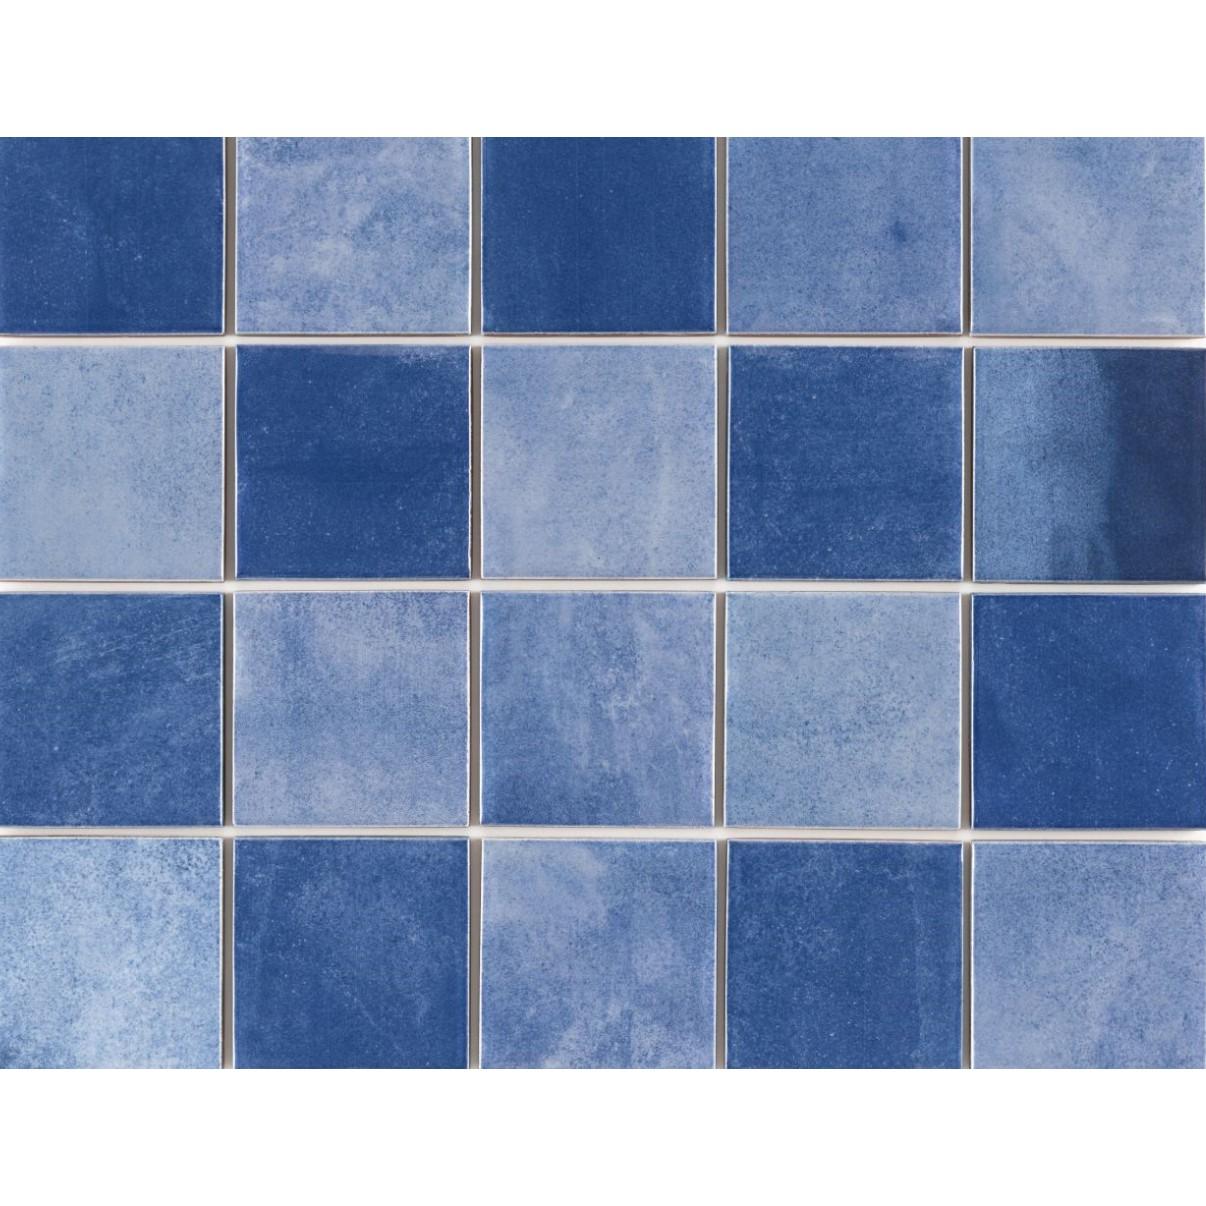 Revestimento Noronha Safira Mesh Brilhante Craquelada 75x75cm 159 m Azul escuro - Eliane